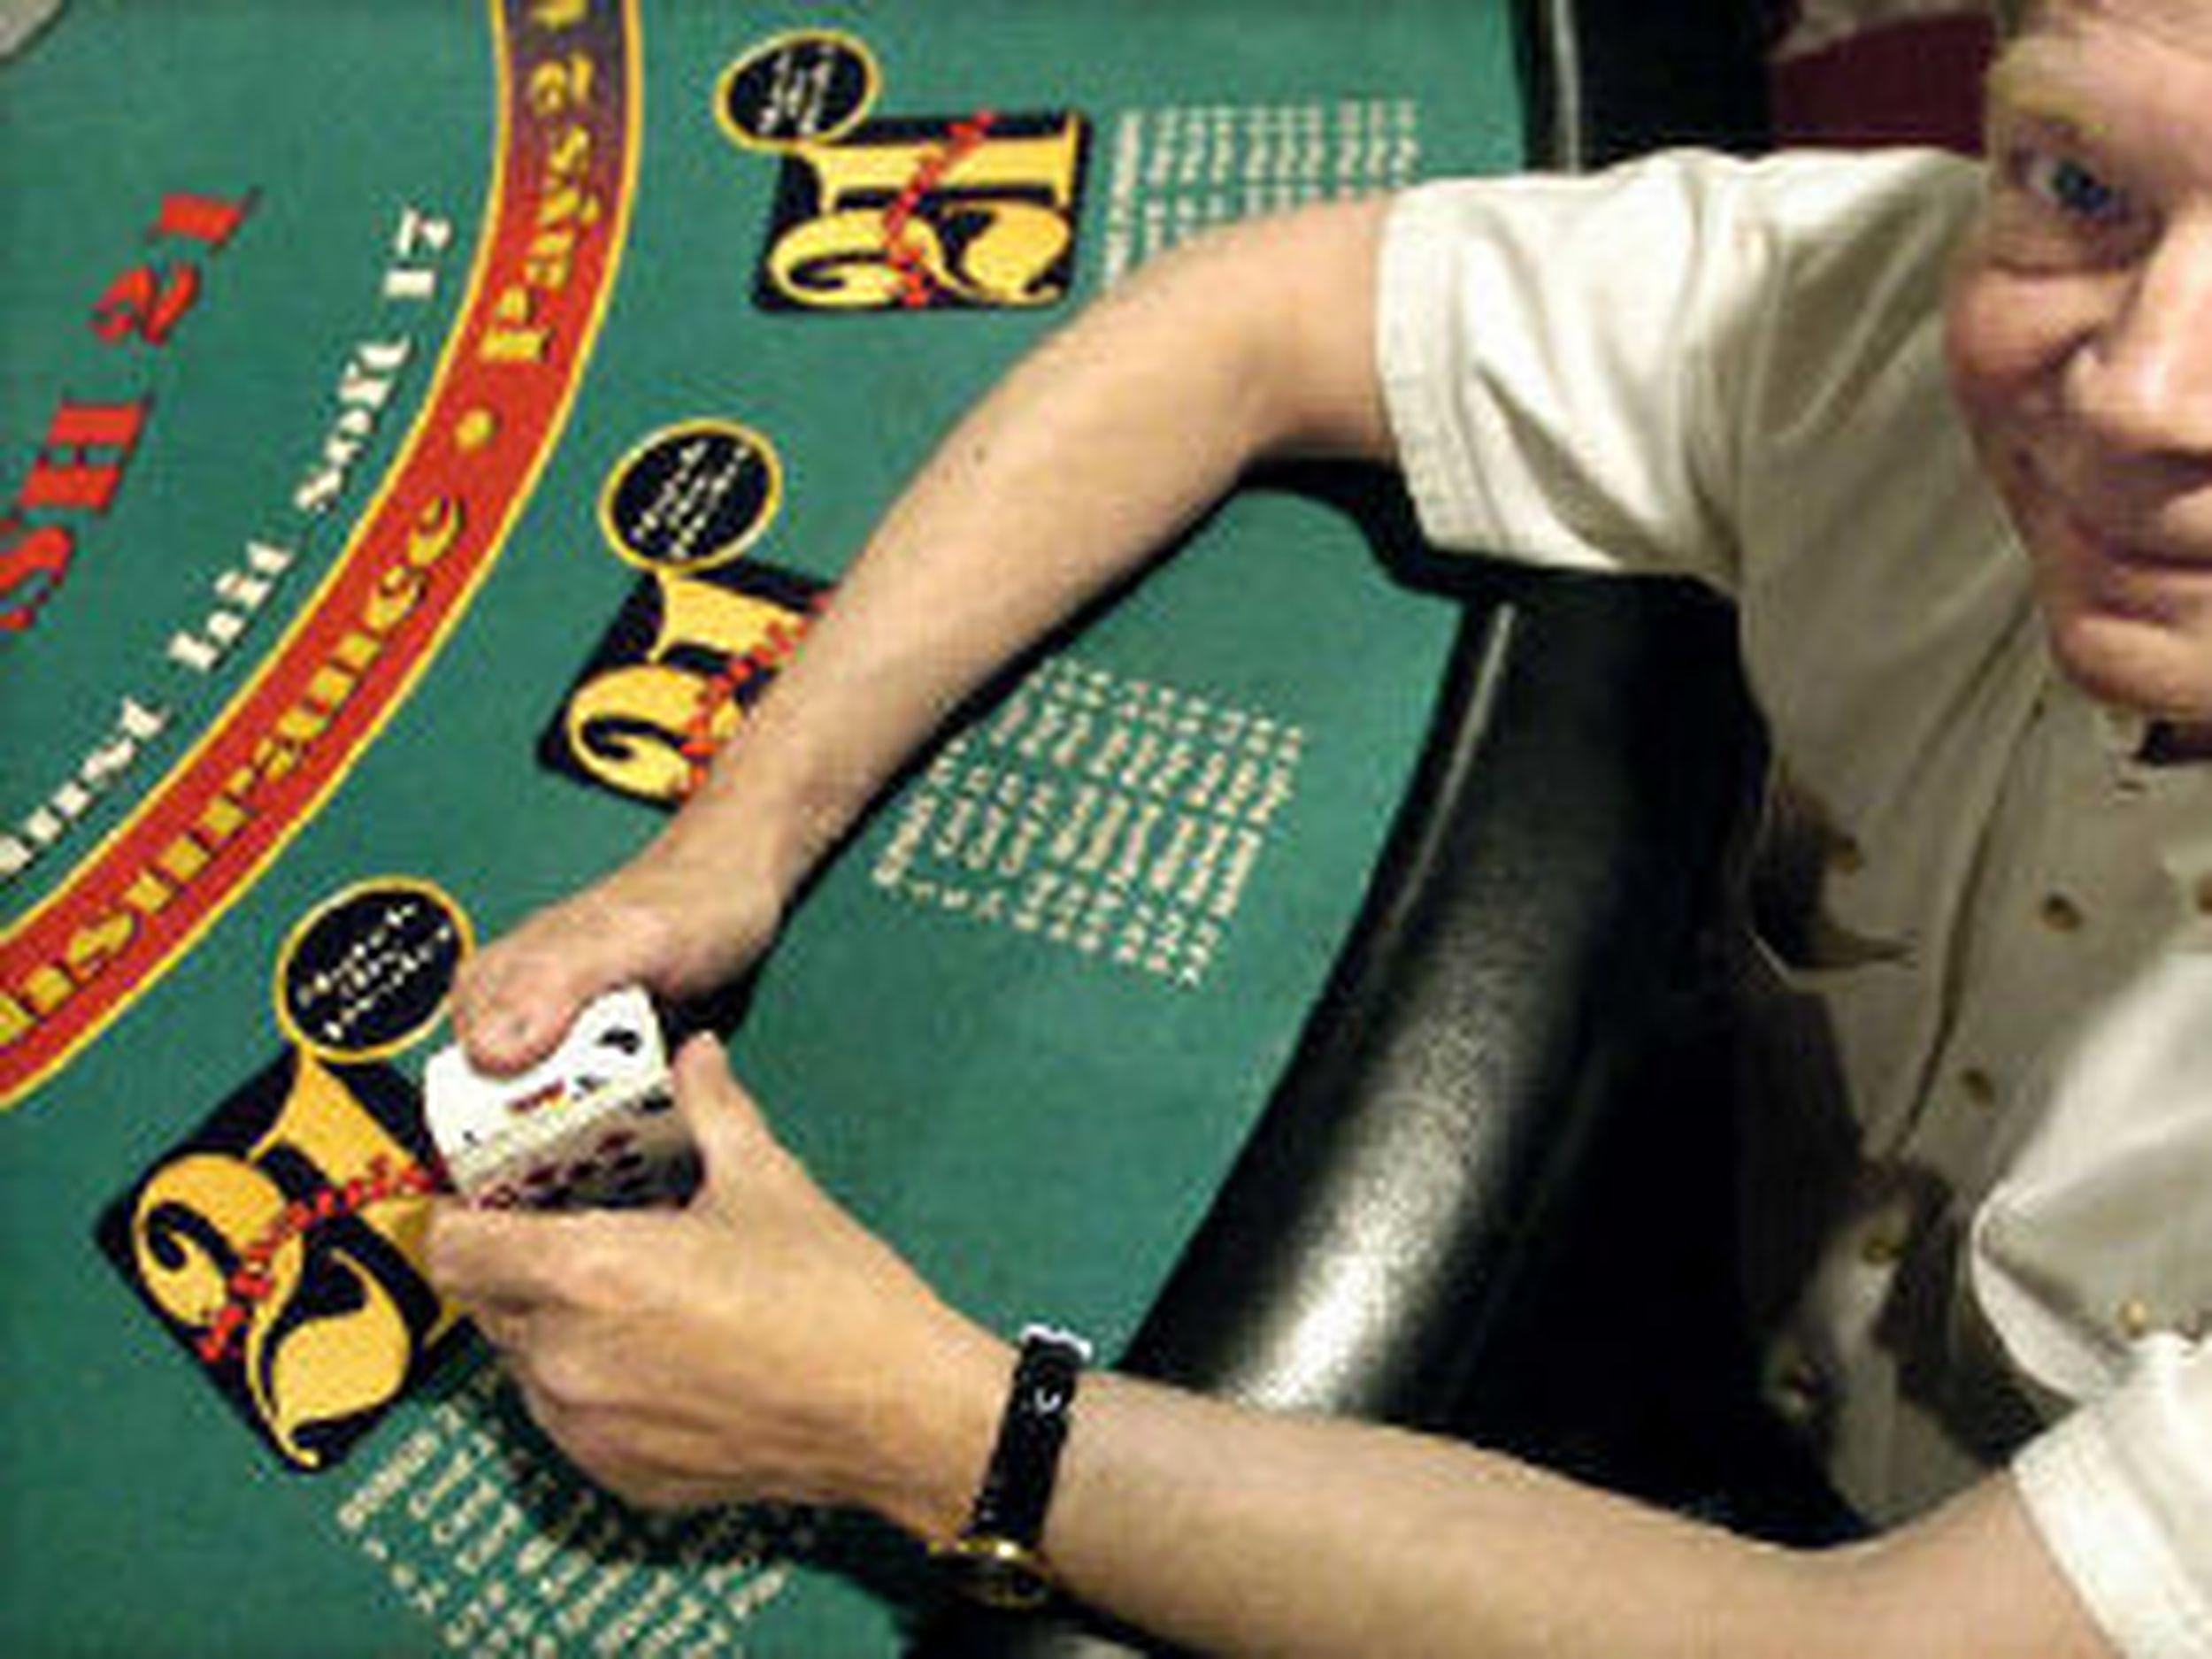 Aces casino poker spokane casino story notes